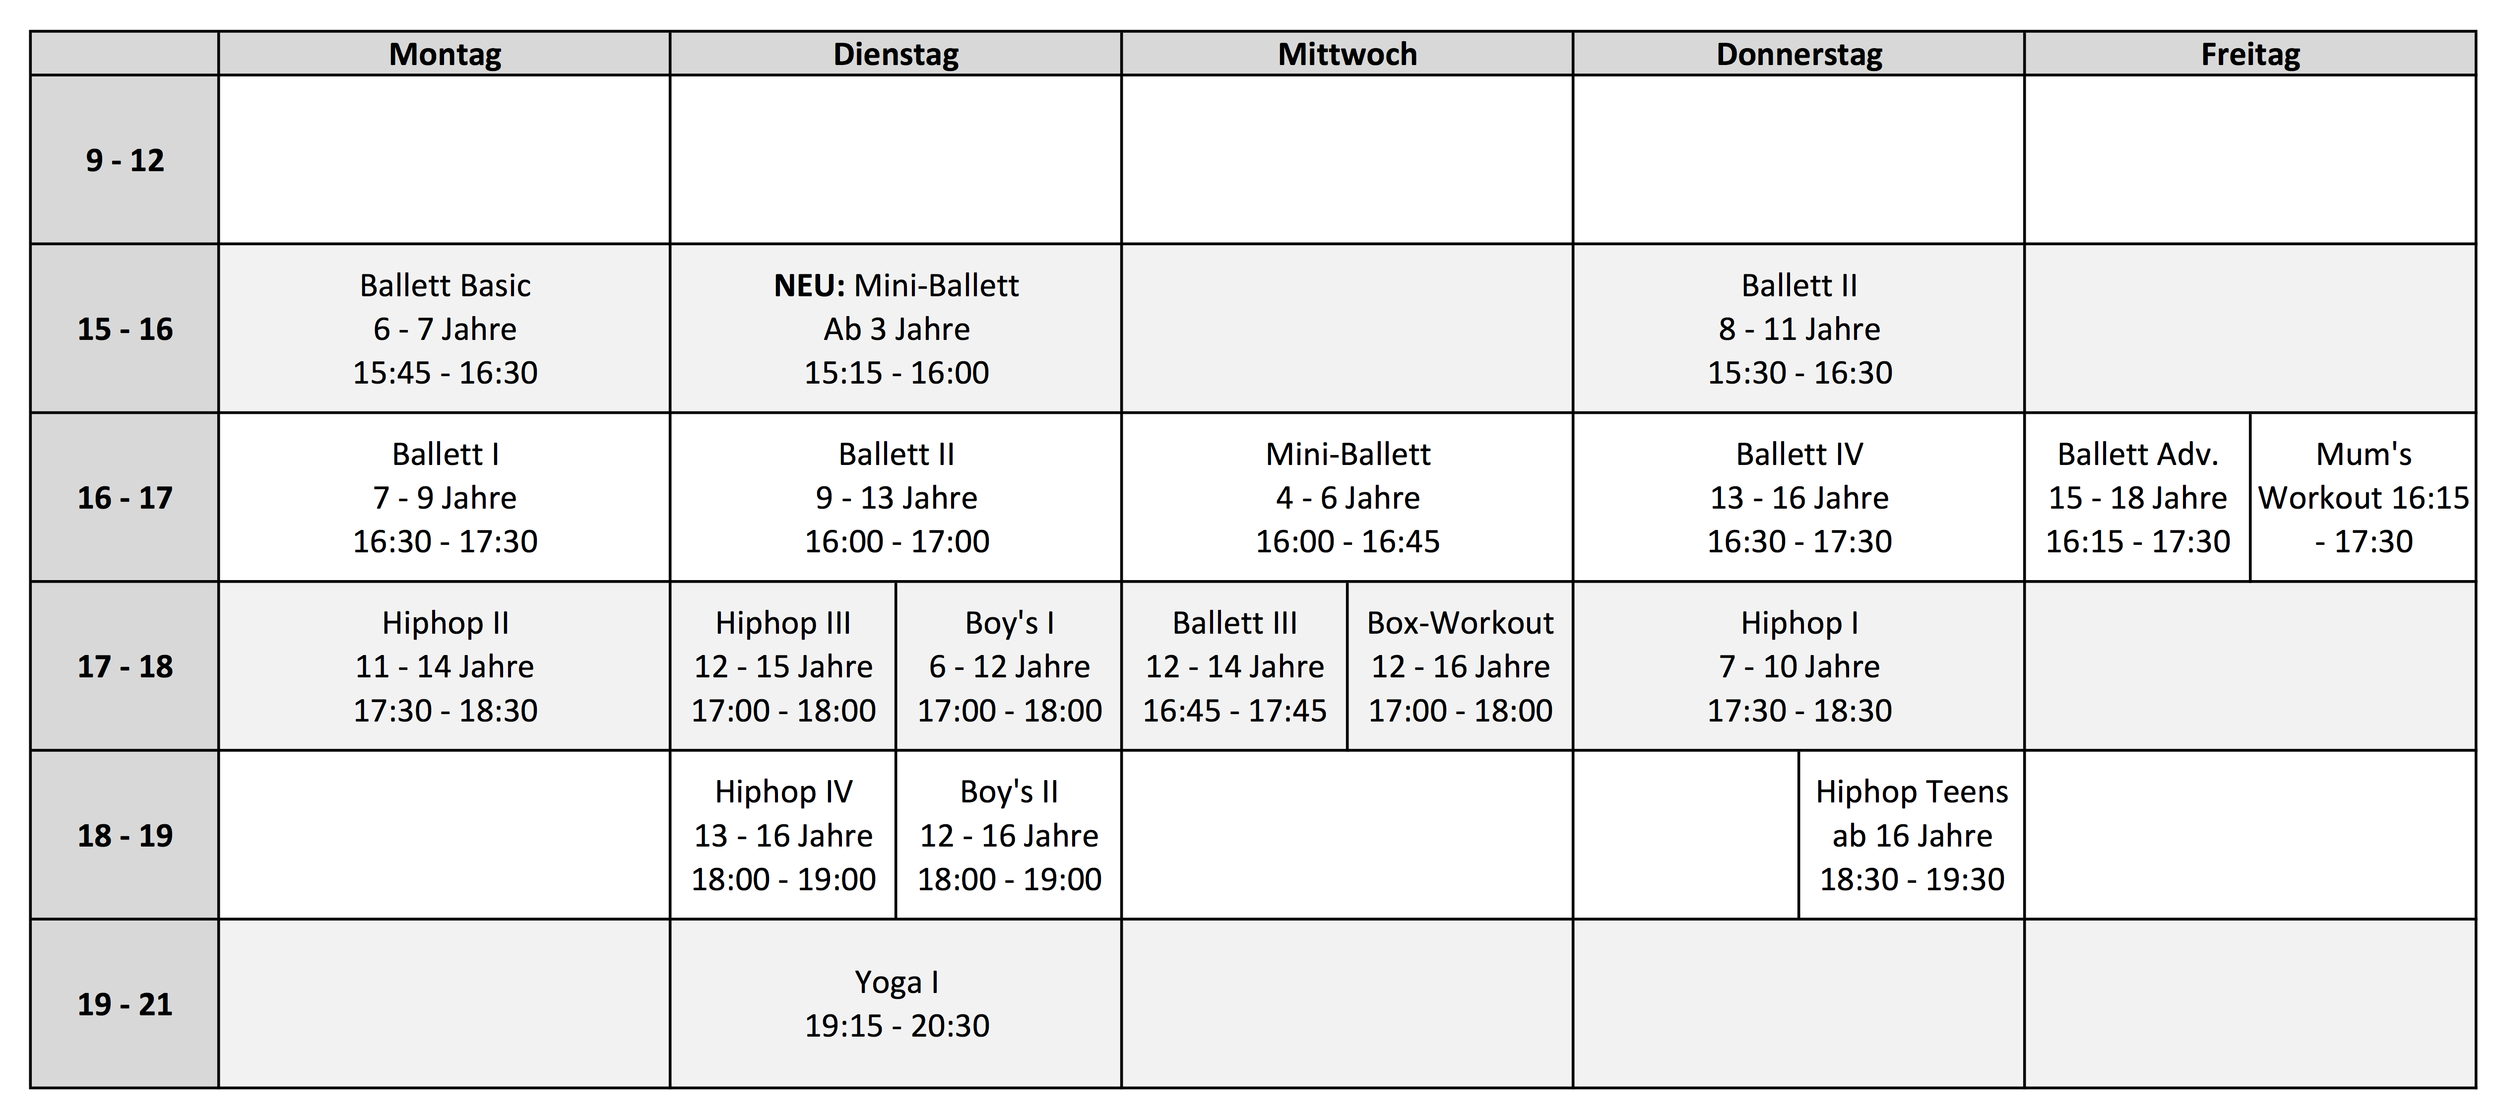 Class Schedule 2019 Cuatro-C Tanzstudio München | Dance Studio Munich